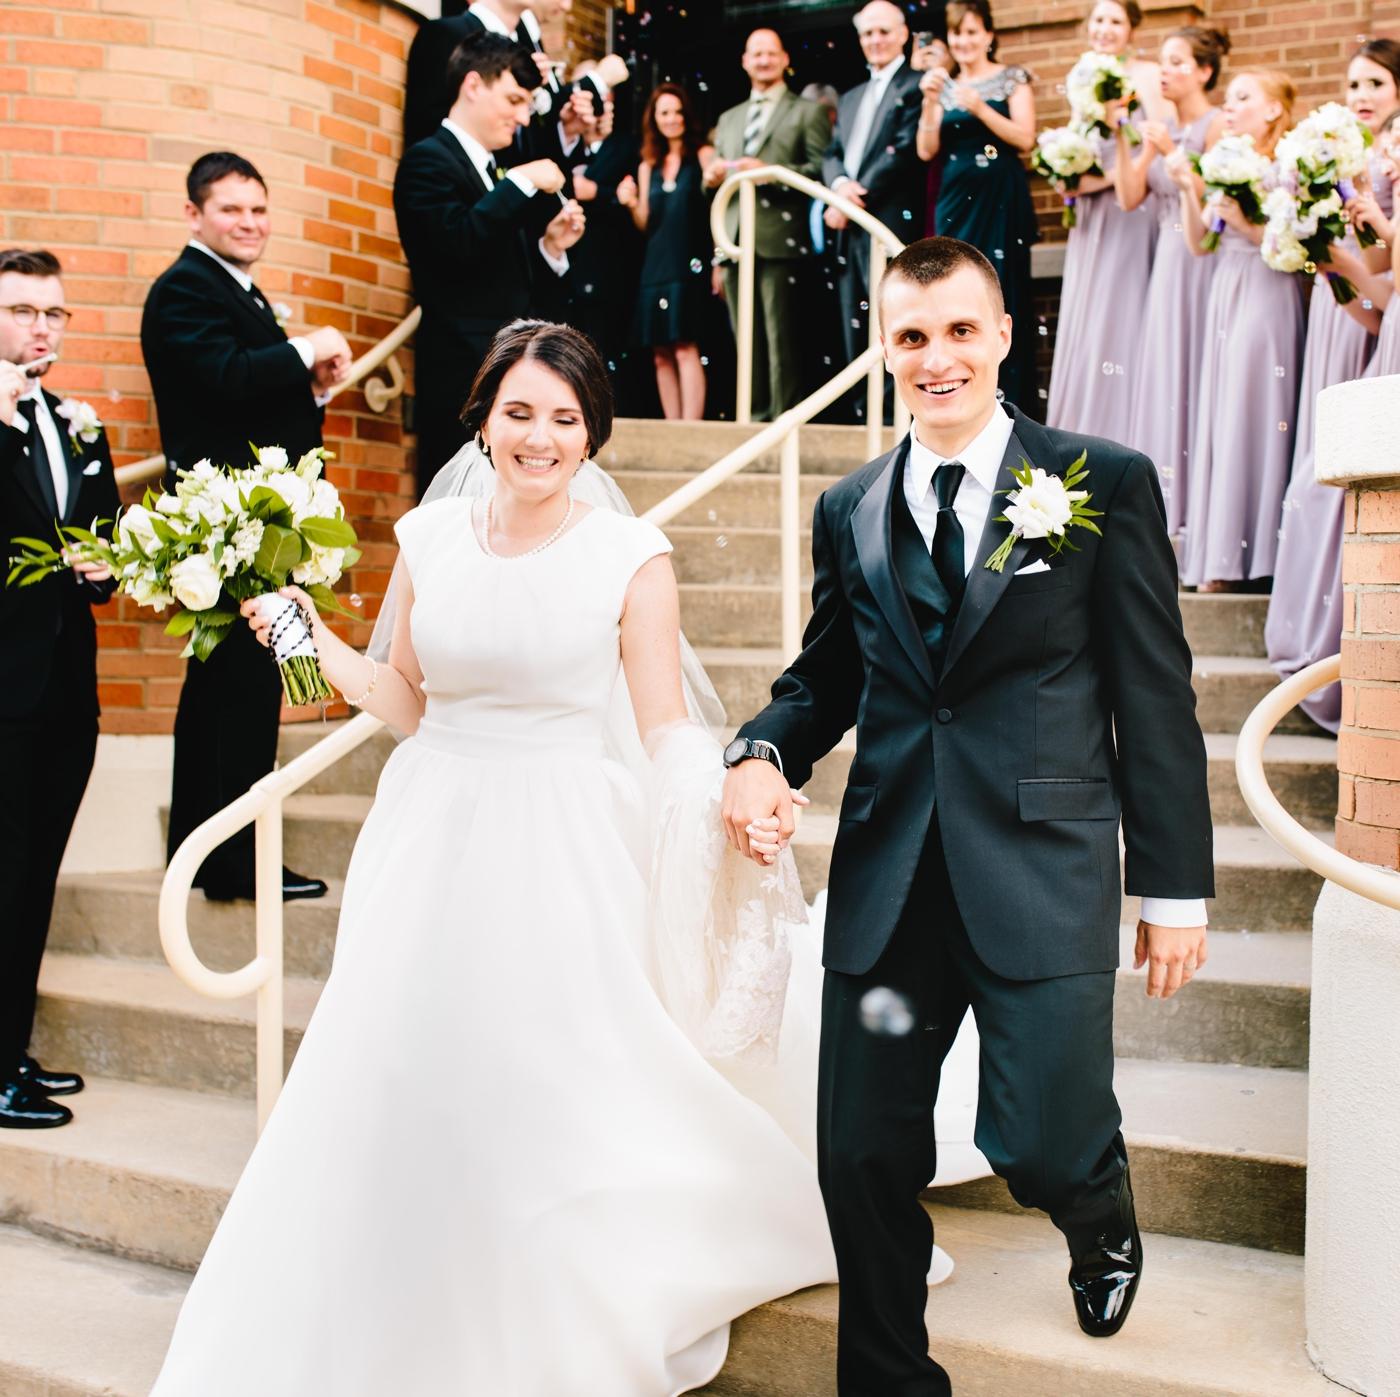 chicago-fine-art-wedding-photography-mccarthy54